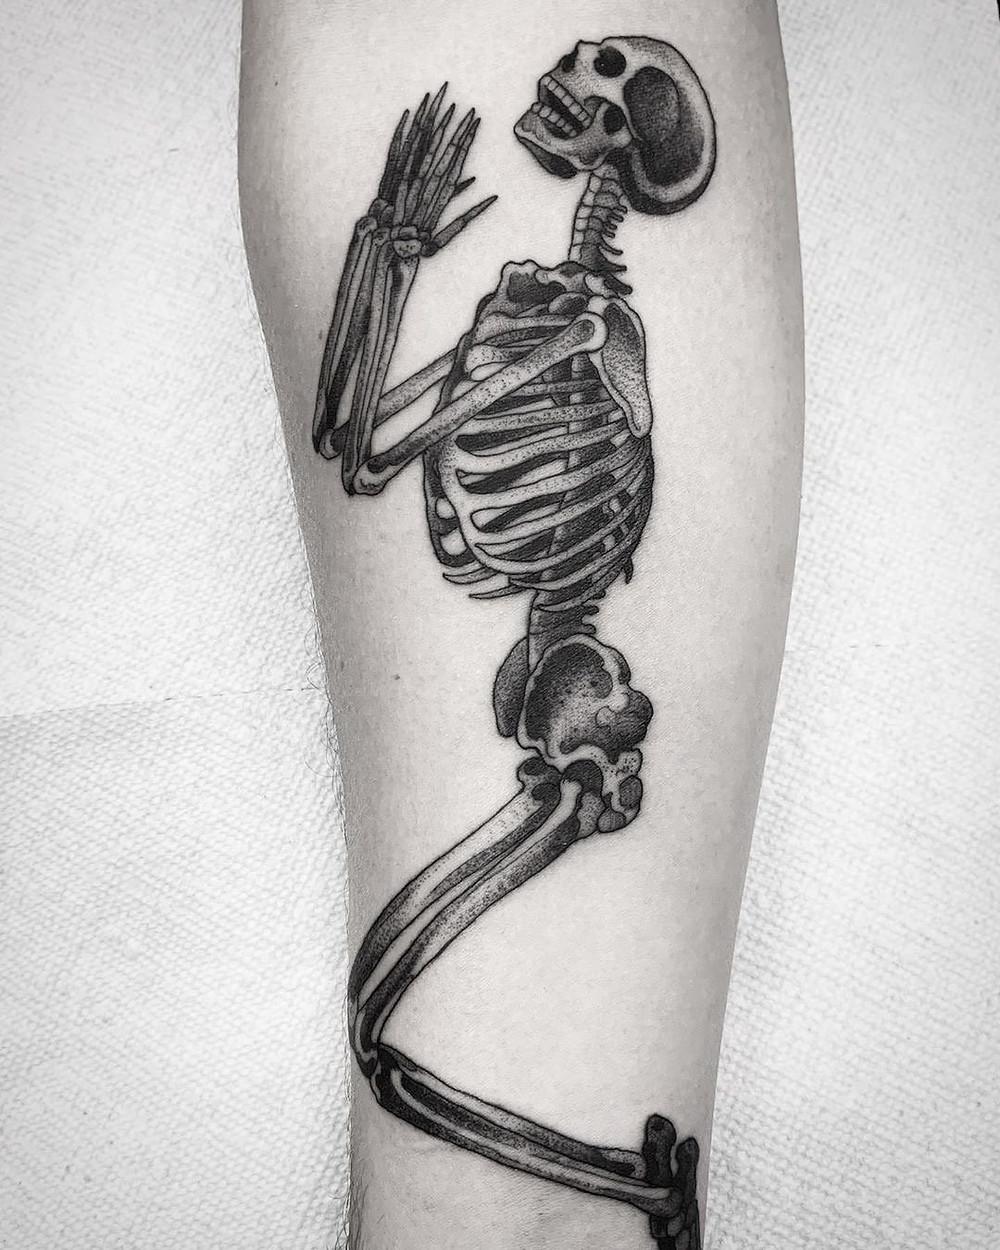 Skeletons need skincare, too.